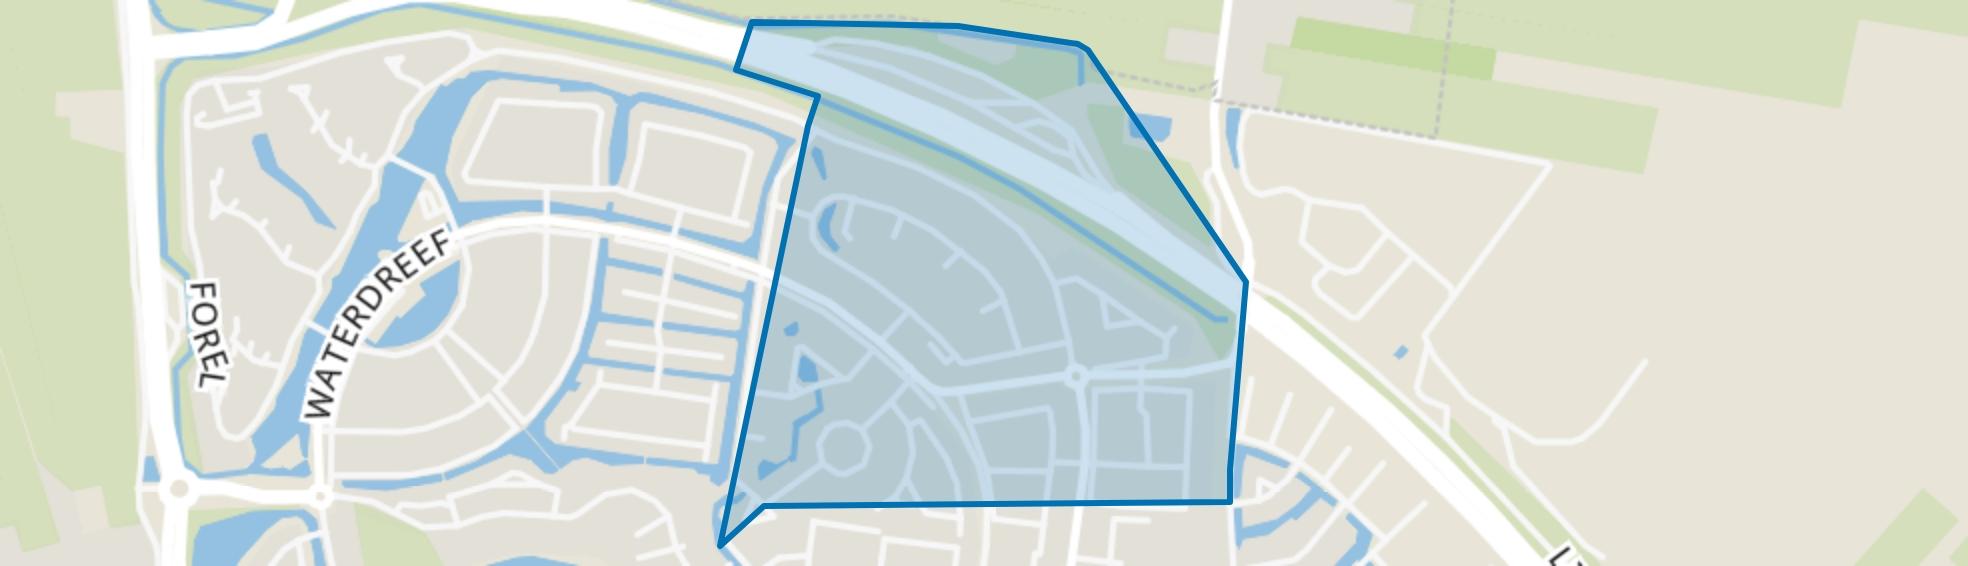 Lage Hoven, Amersfoort map